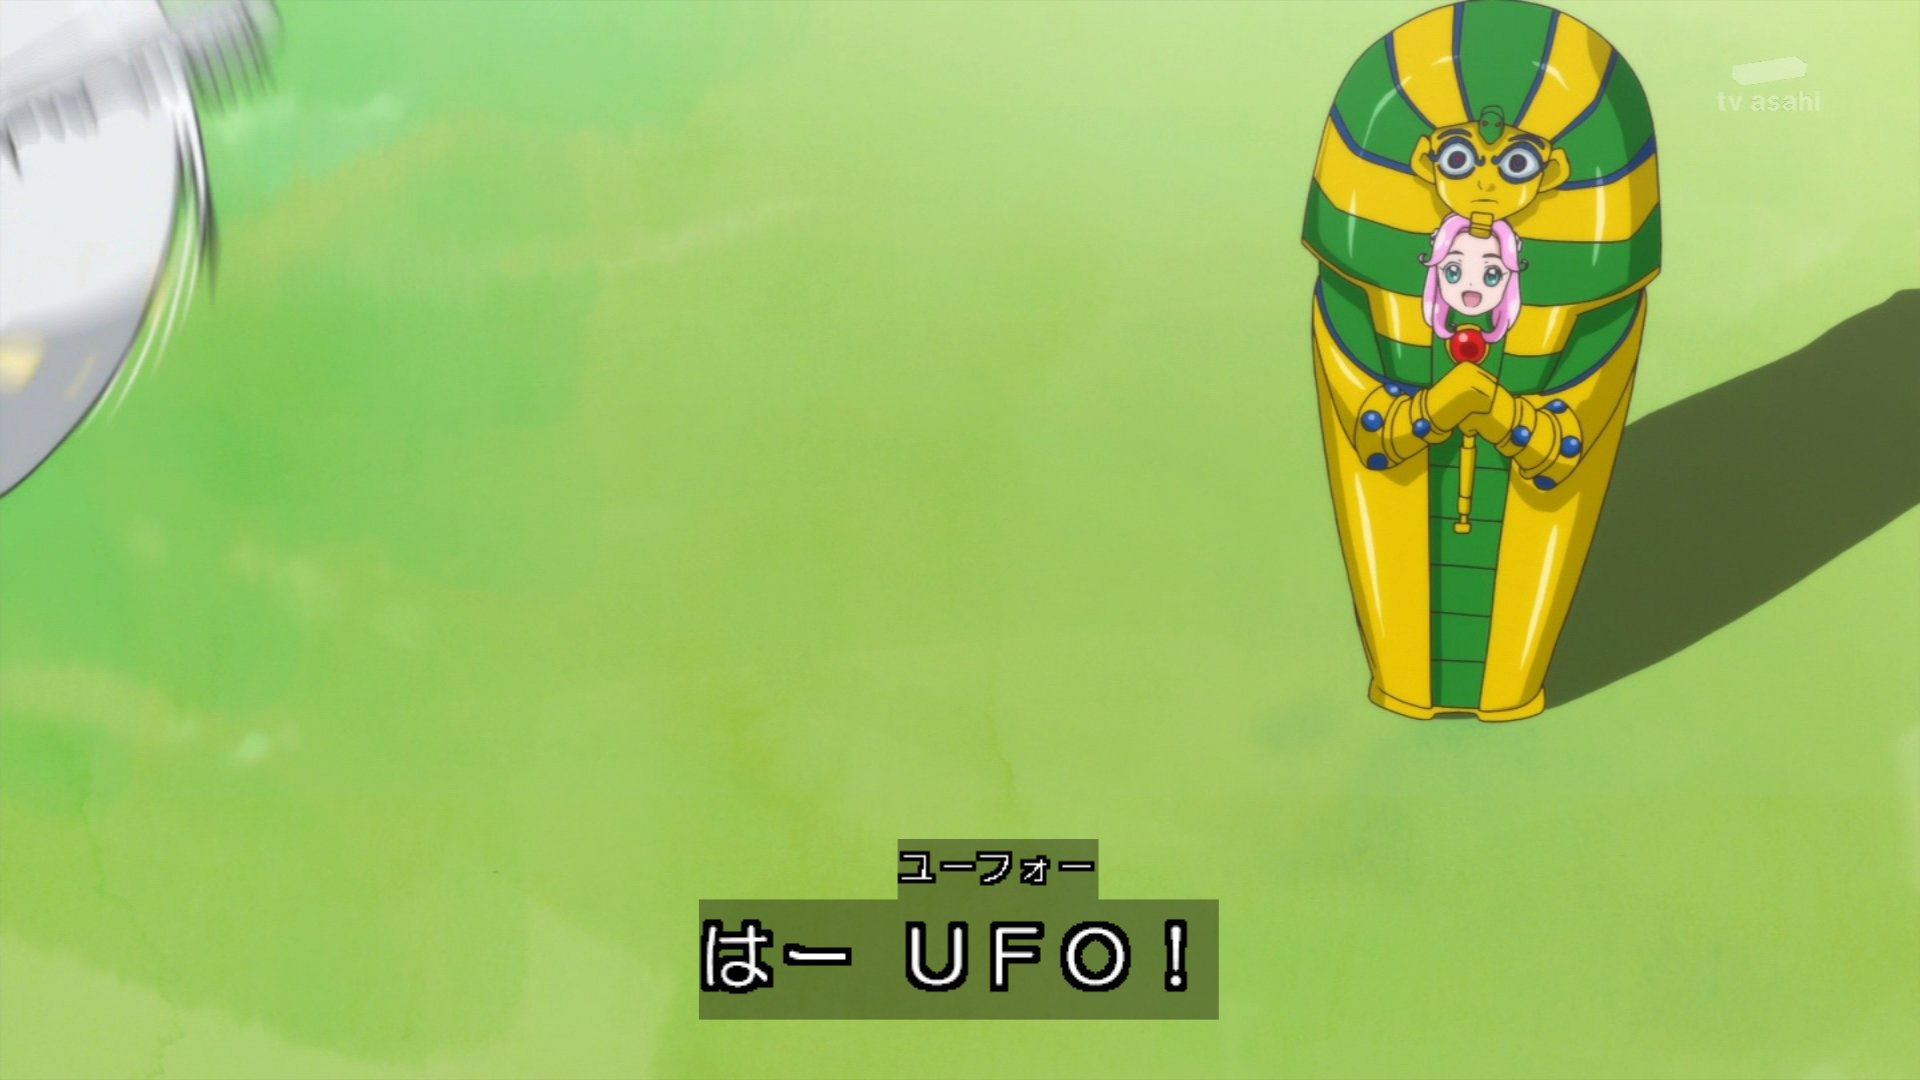 UFO #precure #nitiasa #nichiasa #tvasahi https://t.co/ekzE57eJL6